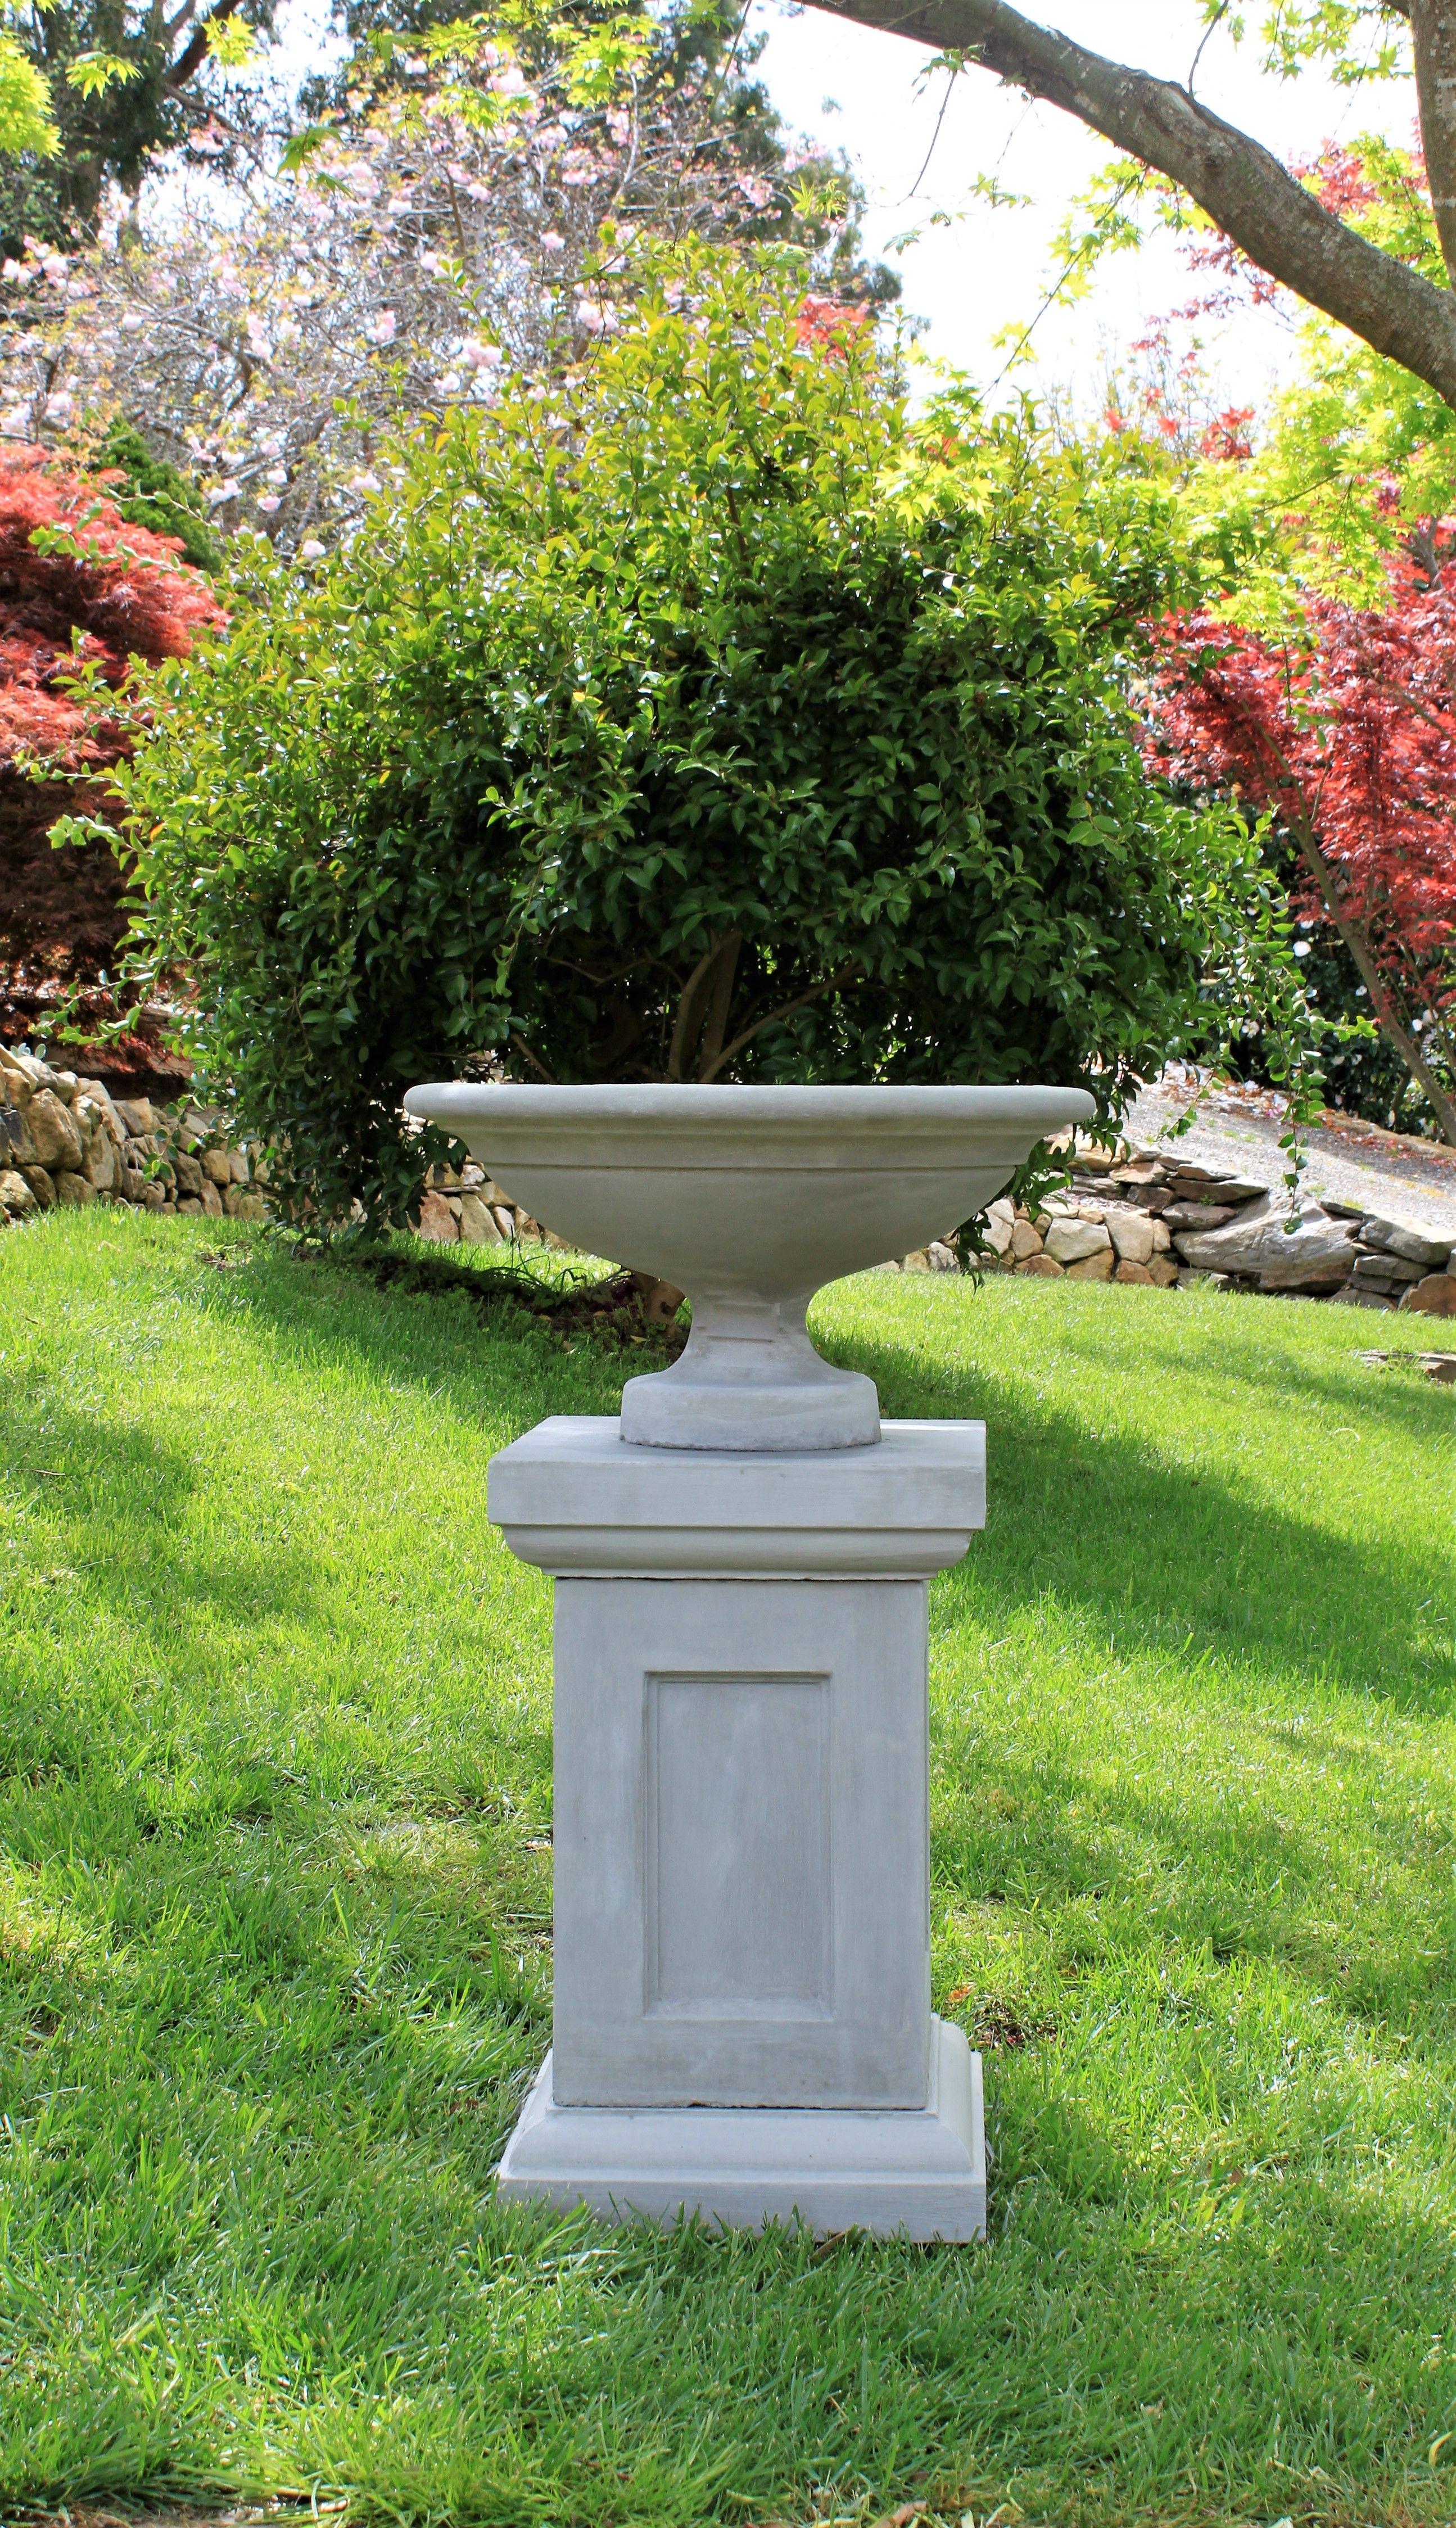 ornament column pedestal lawn pin kenroy patio home garden amazon statues com outdoor square